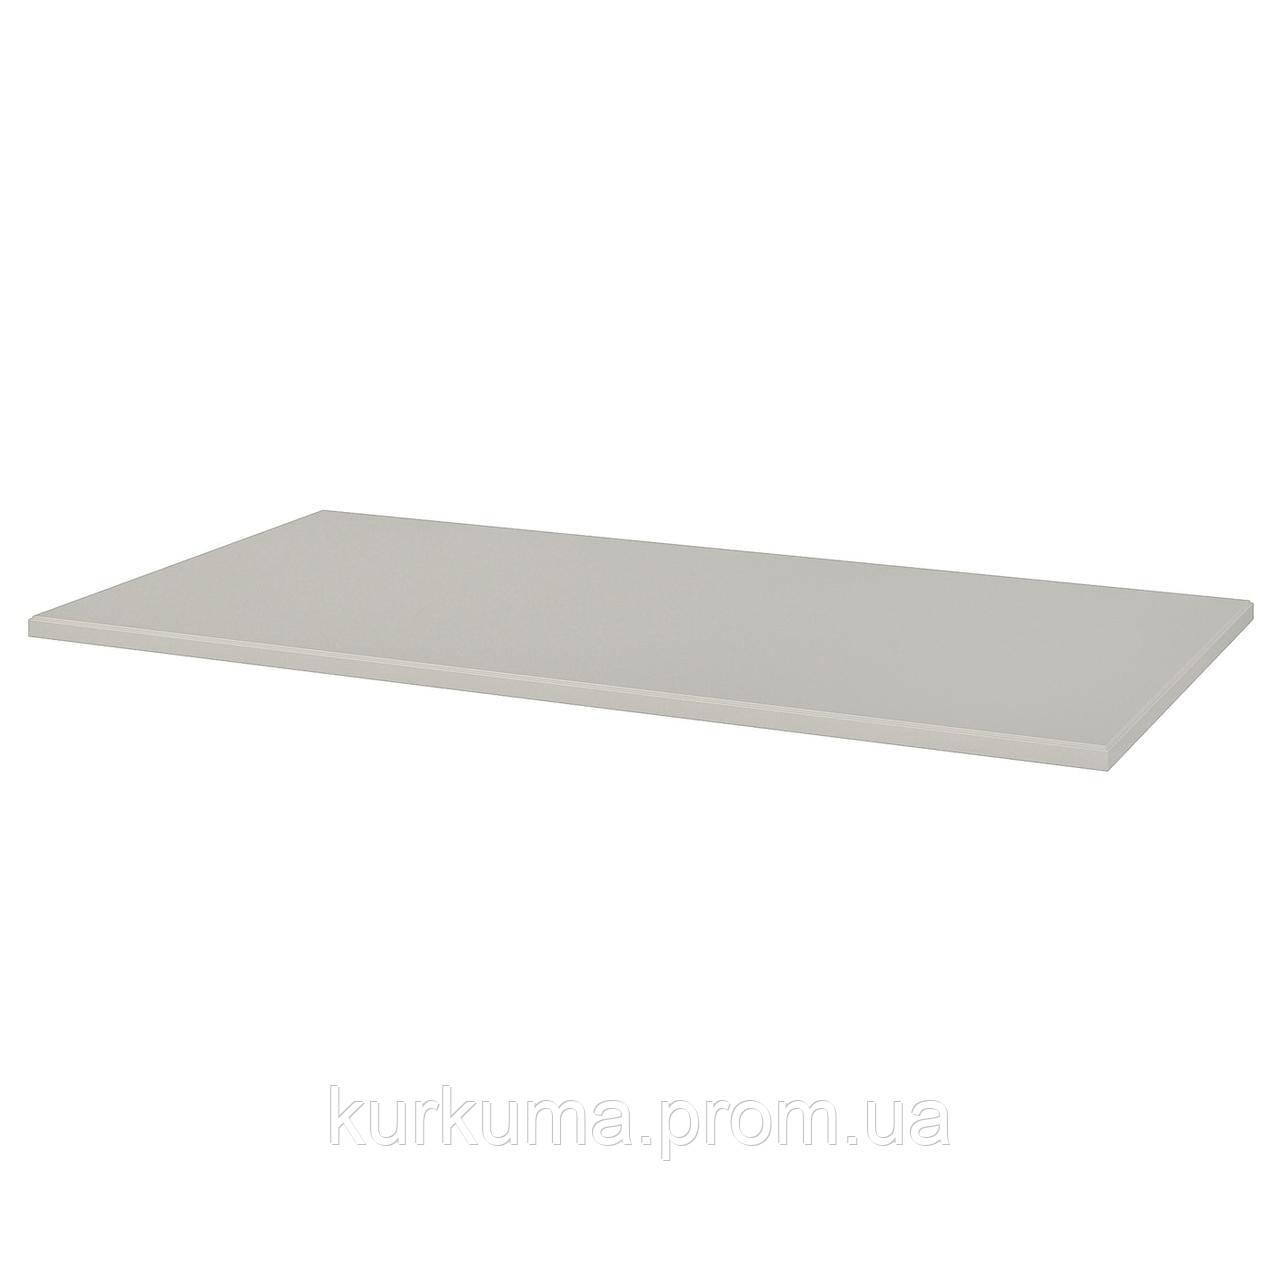 IKEA KLIMPEN Столешница, светло-серый, 150x75 см (903.537.47)